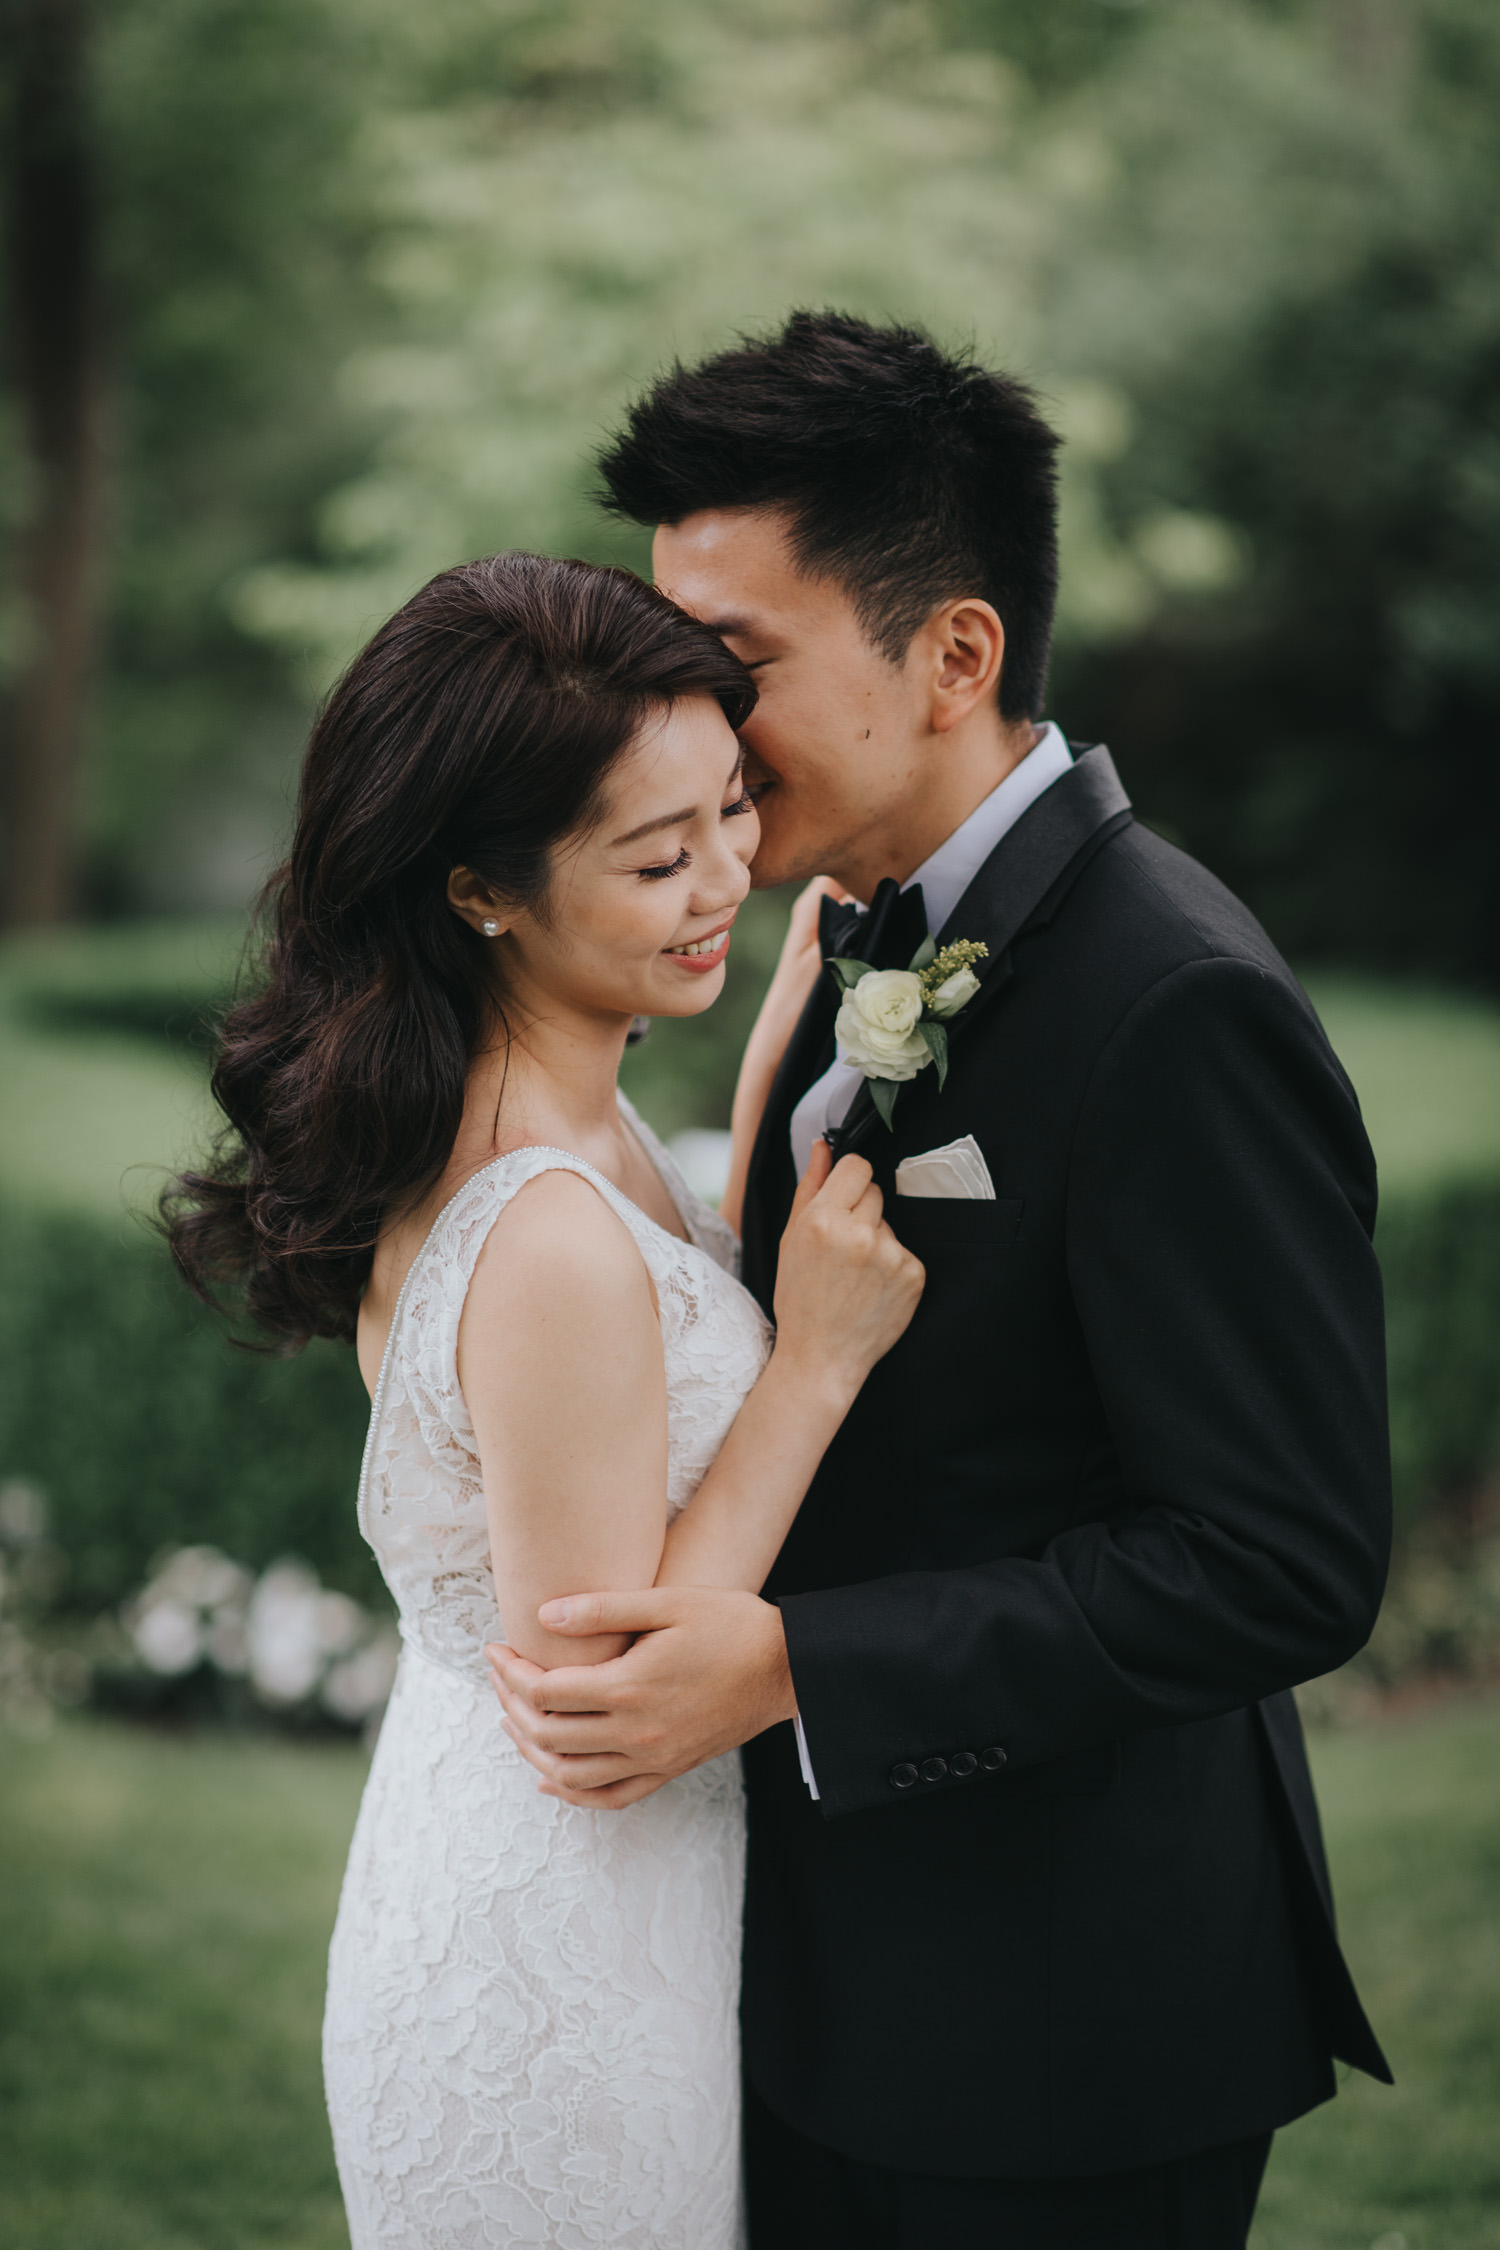 Doctor's House wedding intimate romantic portrait bride and groom